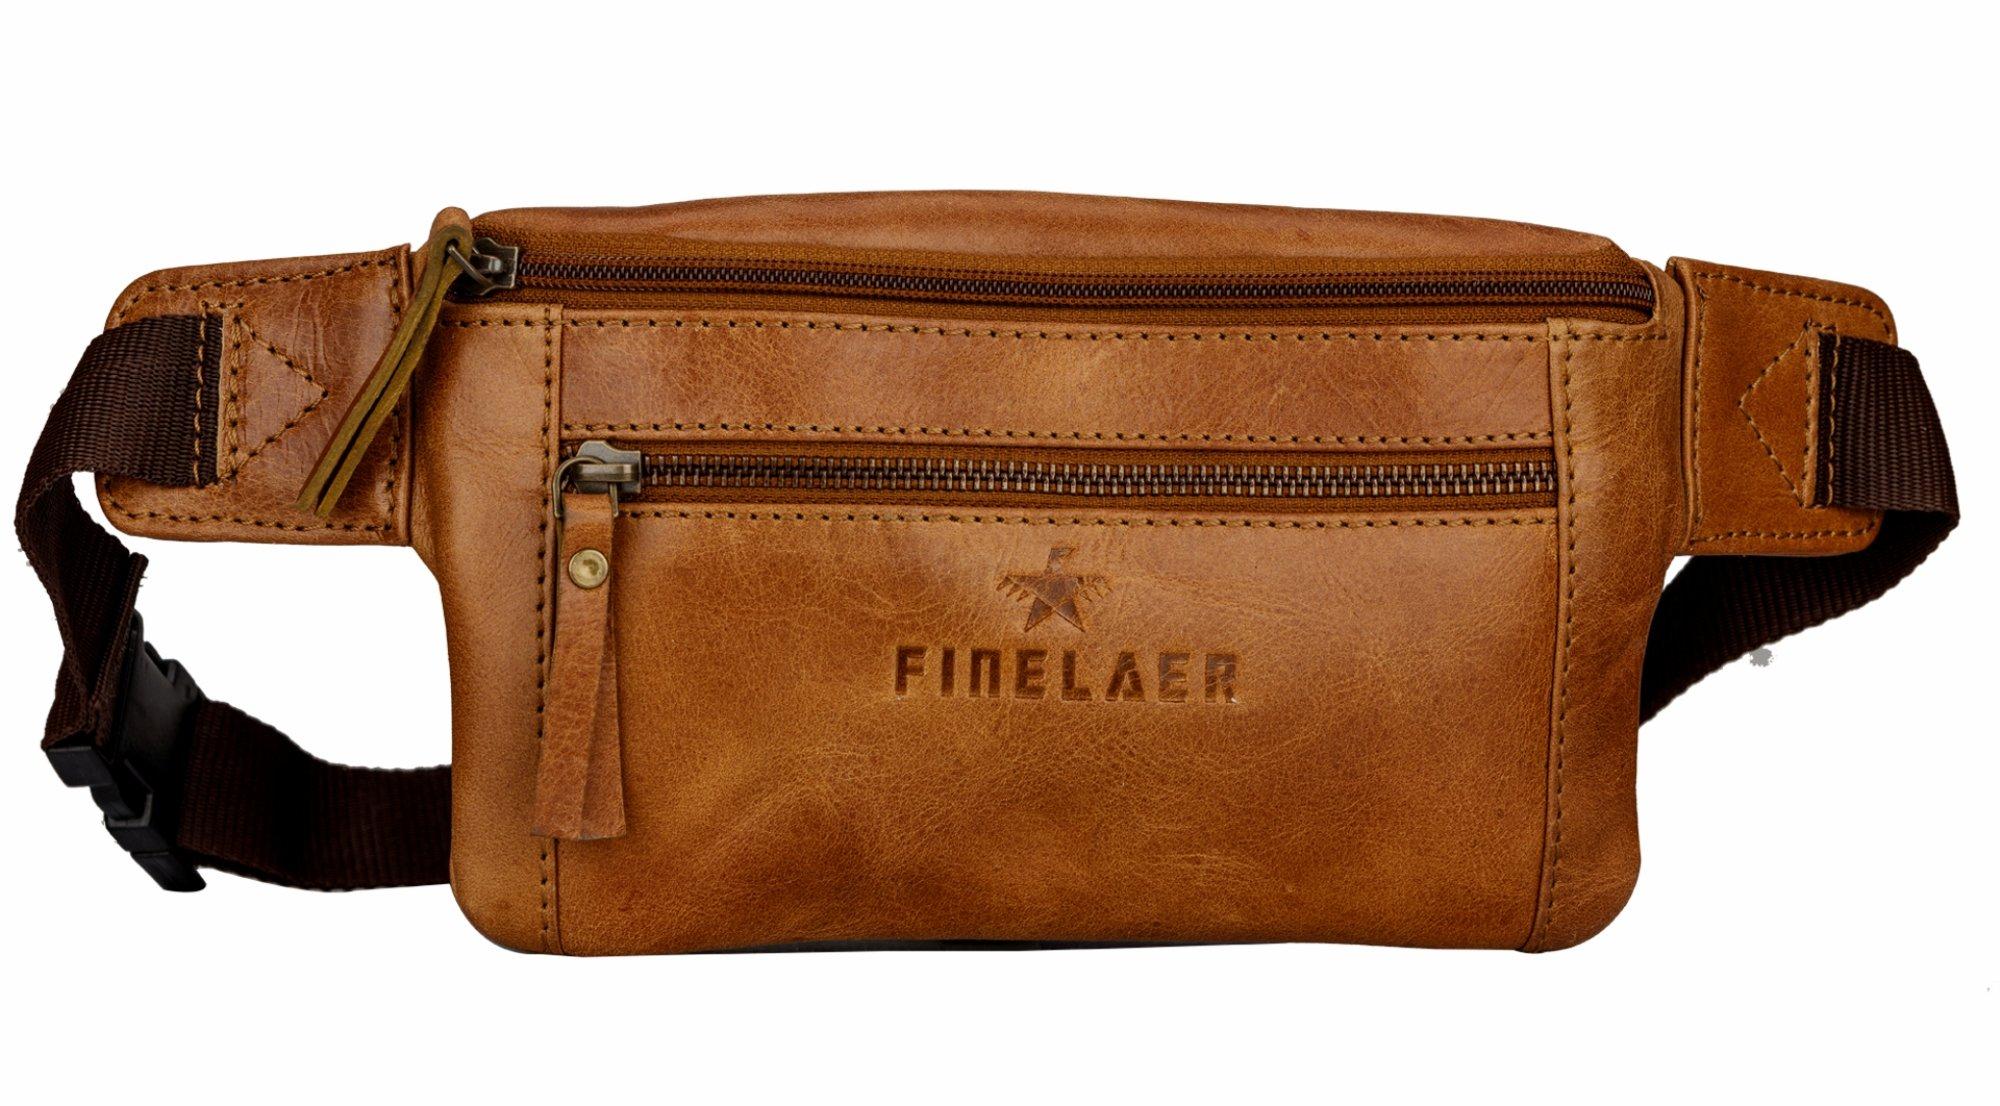 Finelaer Brown Leather Fanny Waist Travel Hiking Pack Bag